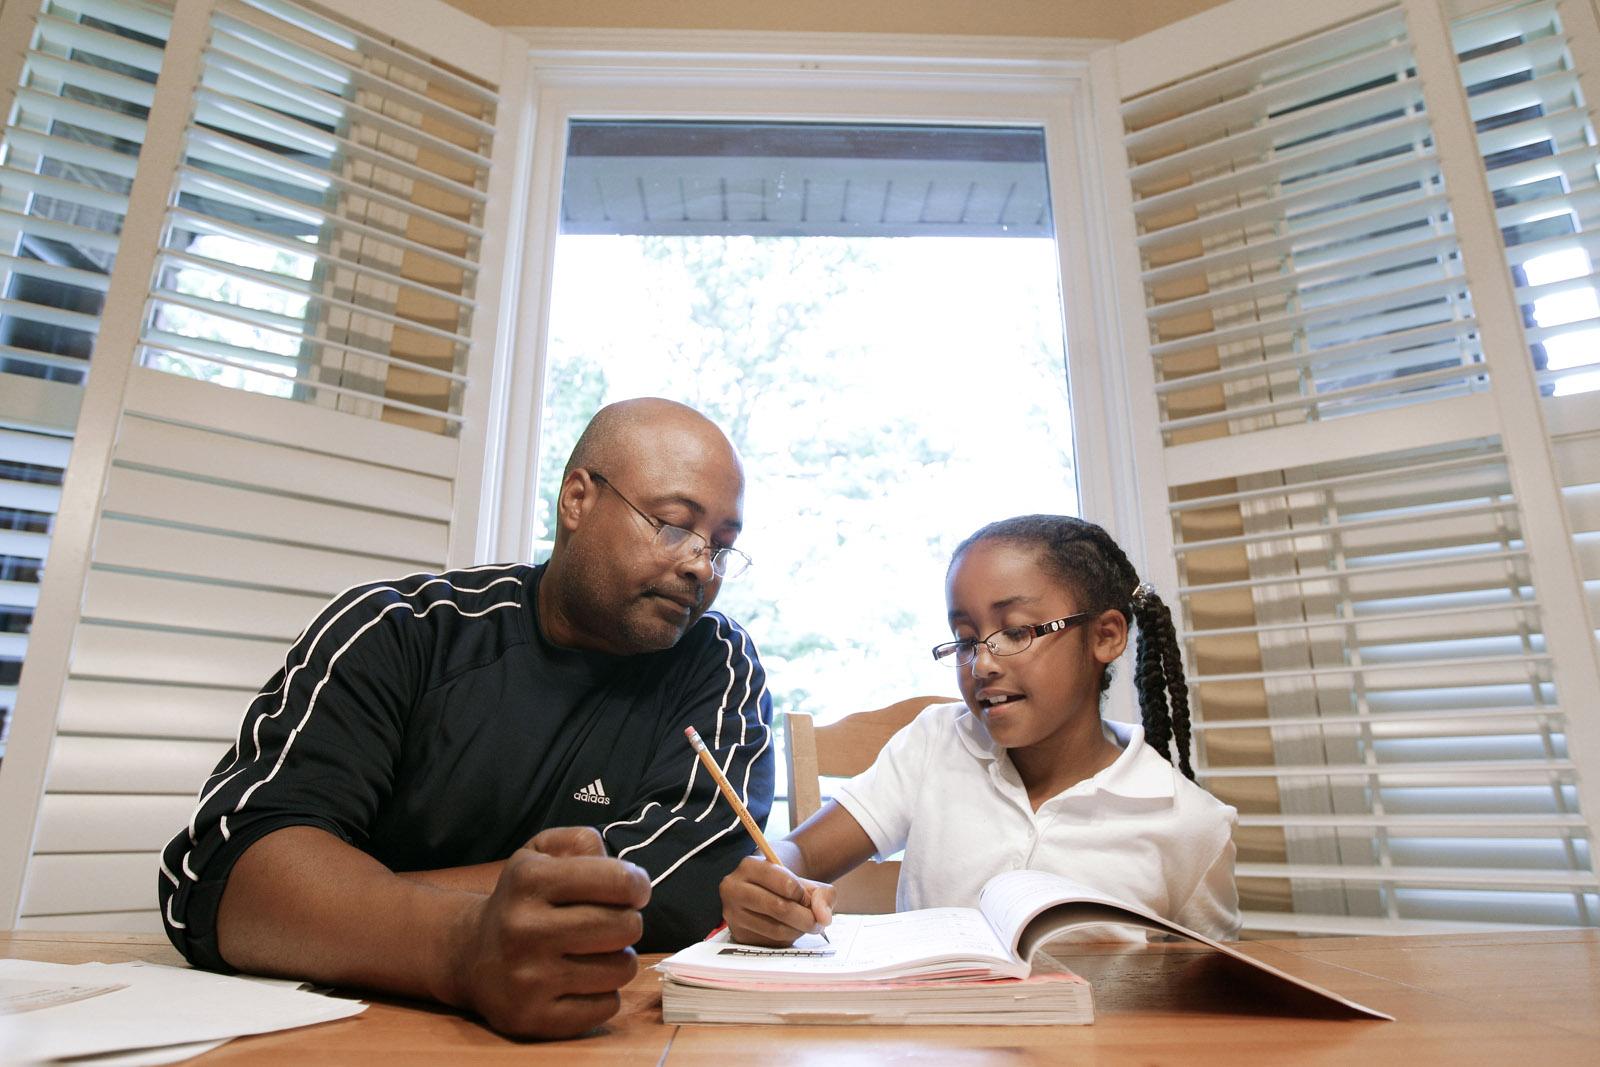 Study strategies to help reduce kids' school-related stress